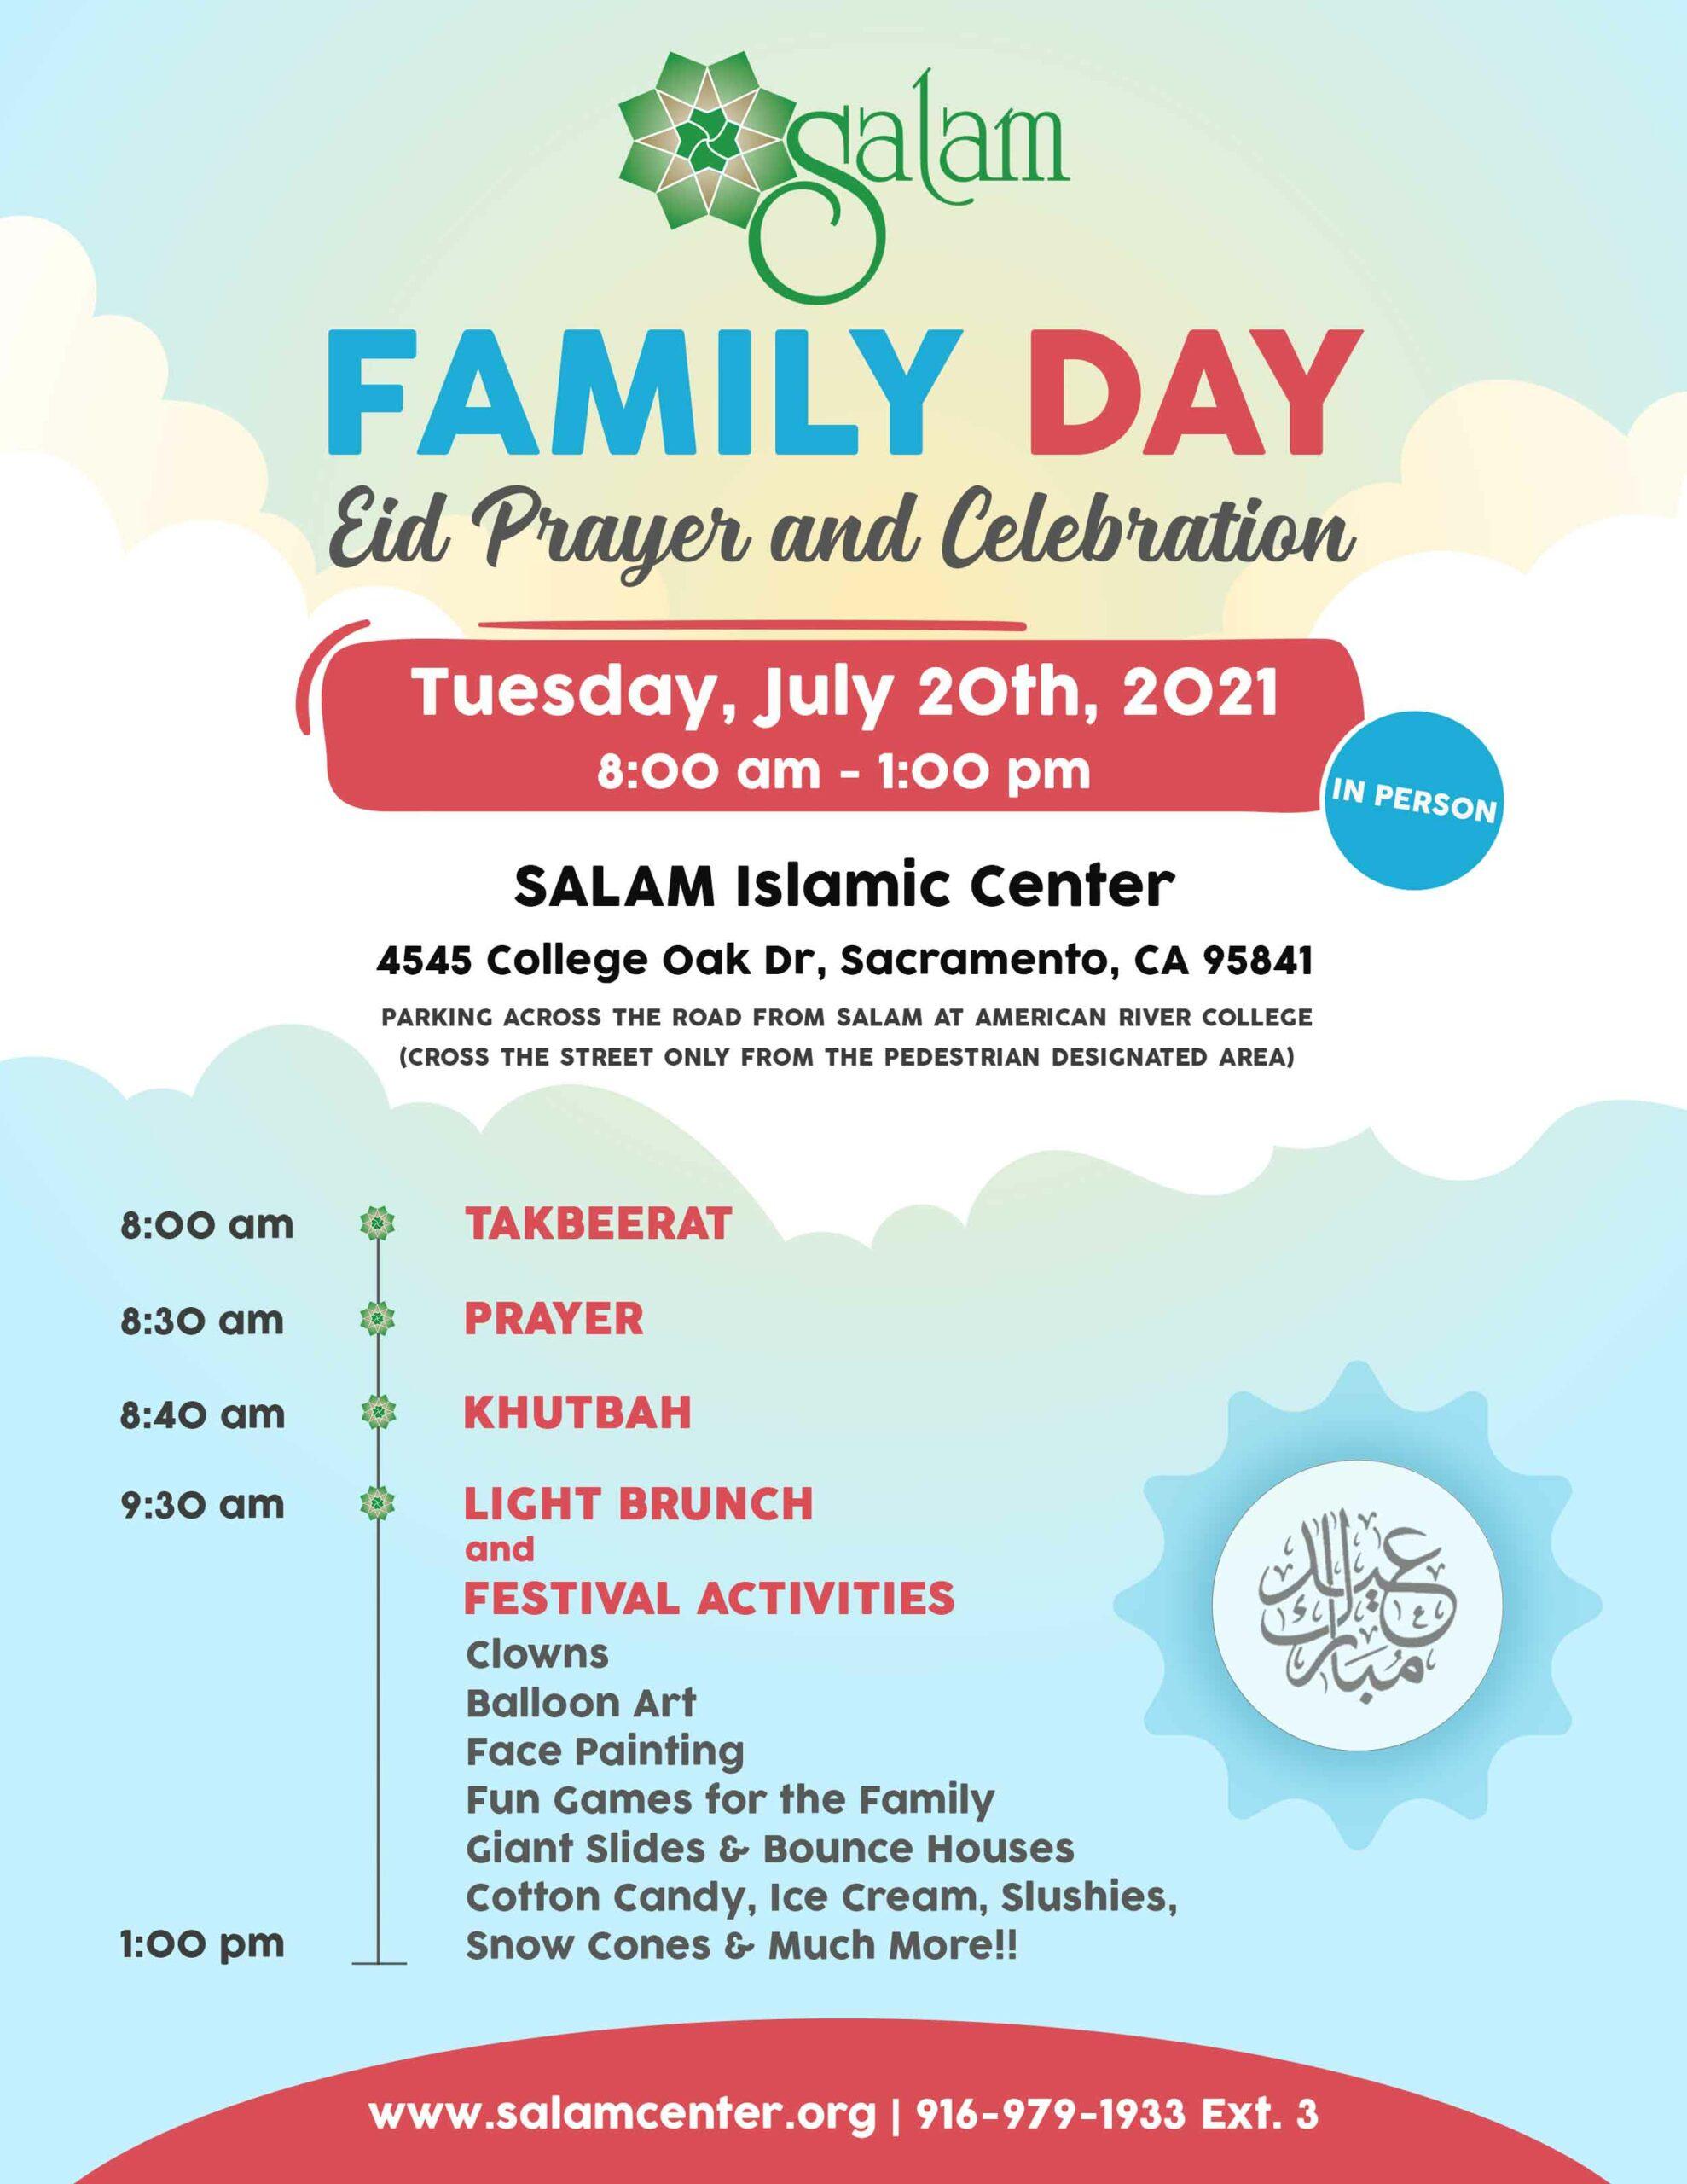 SALAM Eid-ul-adha 2021 Sacramento, CA